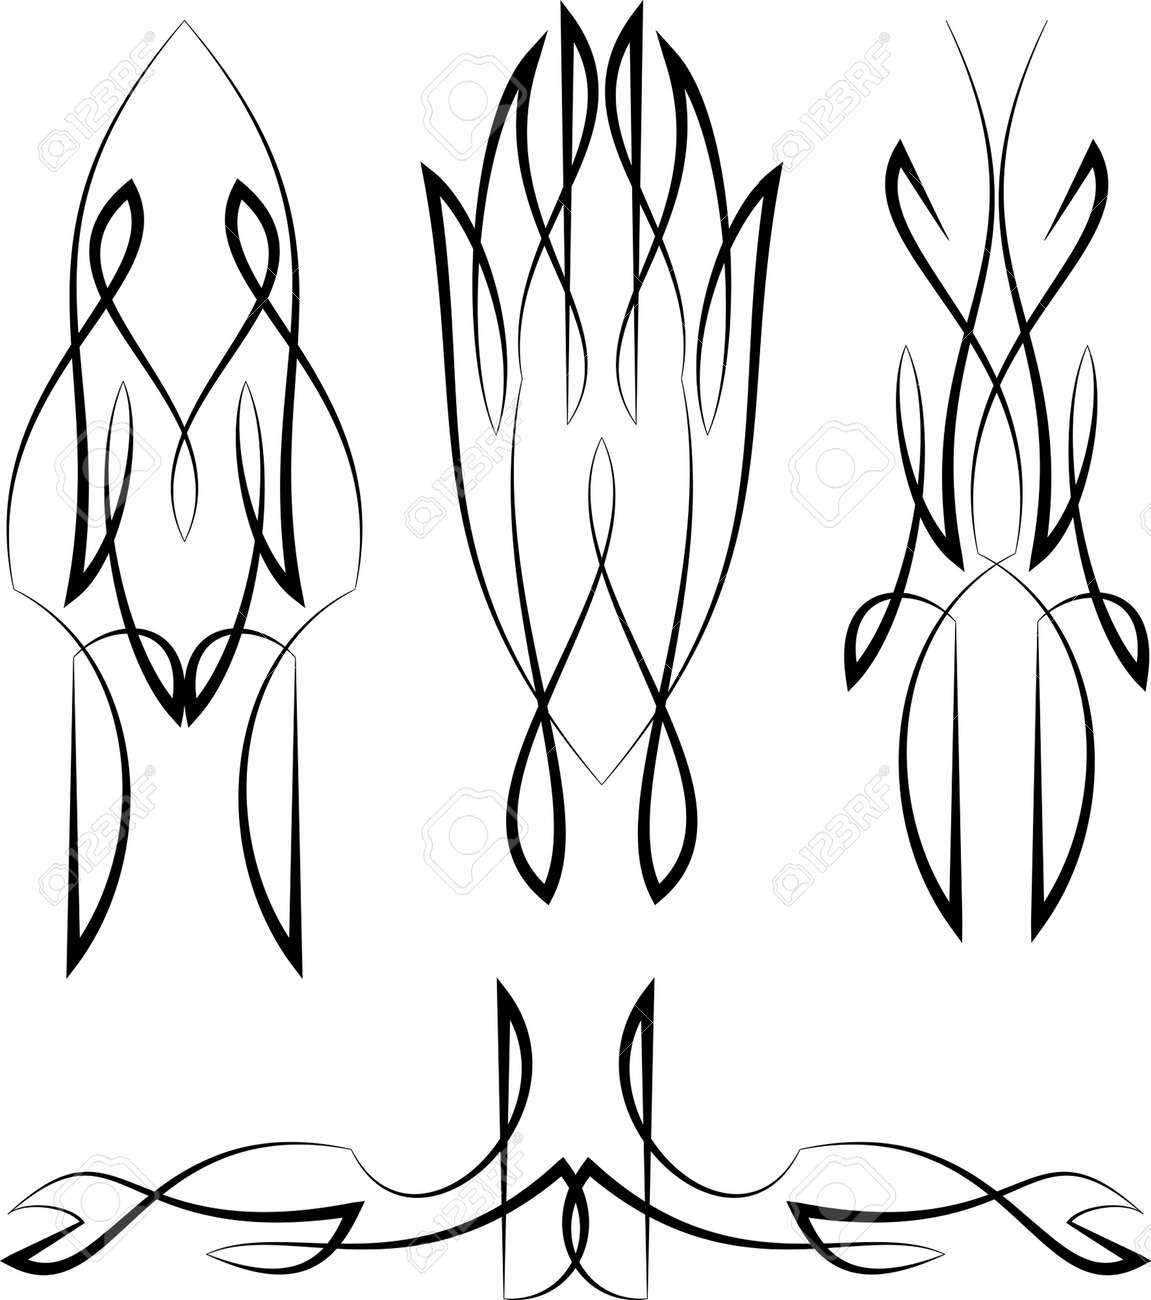 pinstripe graphics vinyl ready vector art royalty free cliparts rh 123rf com pinstripe vector graphics pinstripe vector download